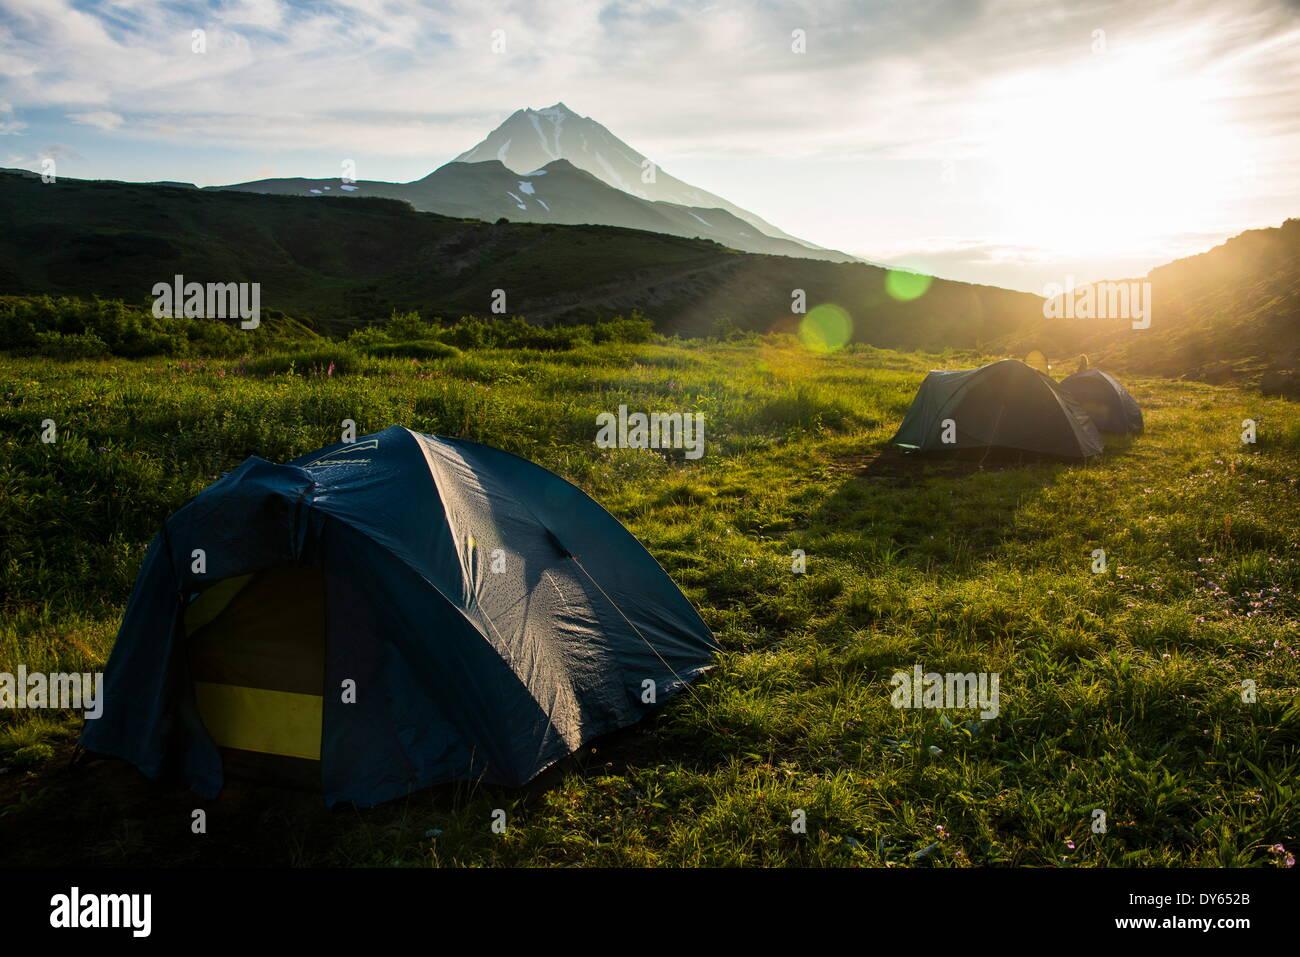 Camping below Vilyuchinsk volcano, Kamchatka, Russia, Eurasia - Stock Image